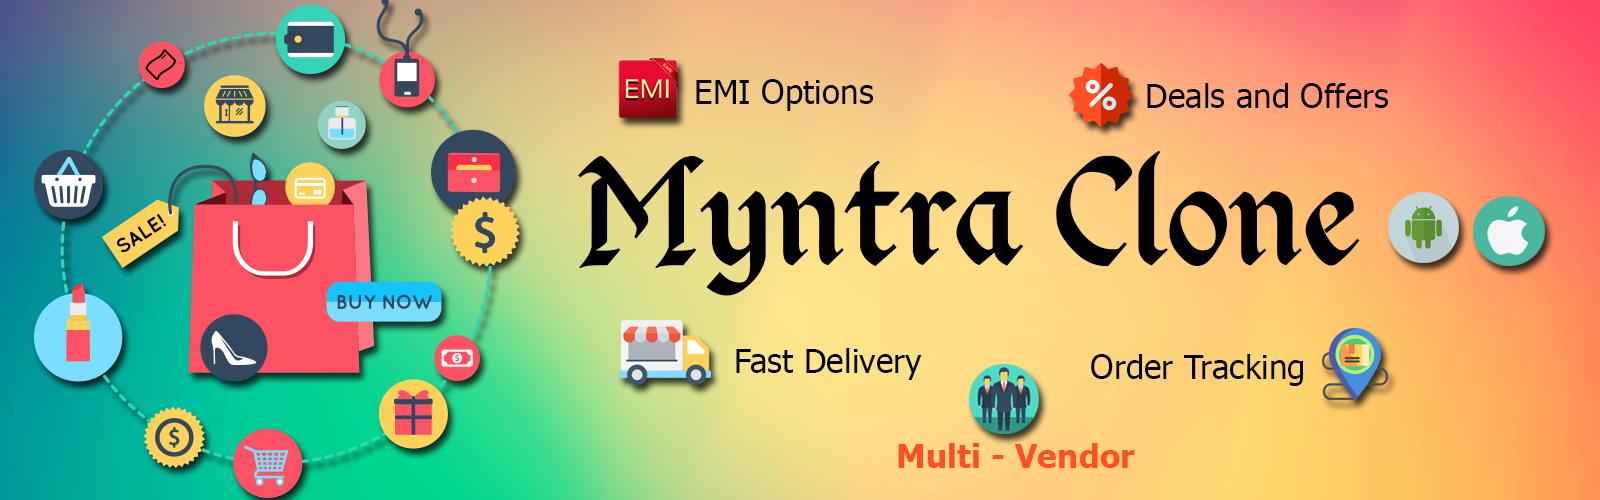 Myntra Clone banner